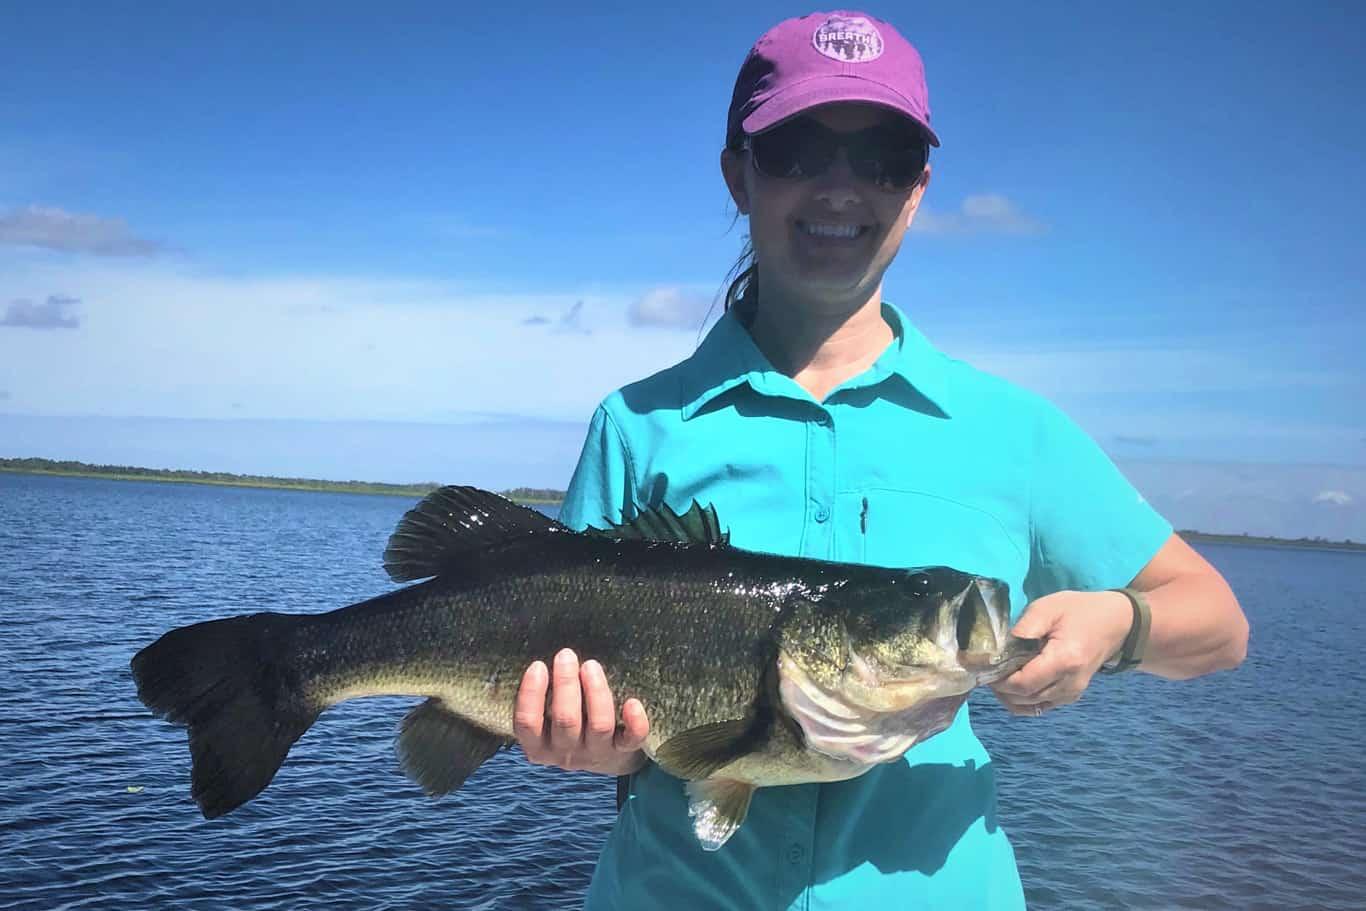 Angler Academy - Ladies Let's Go Fishing